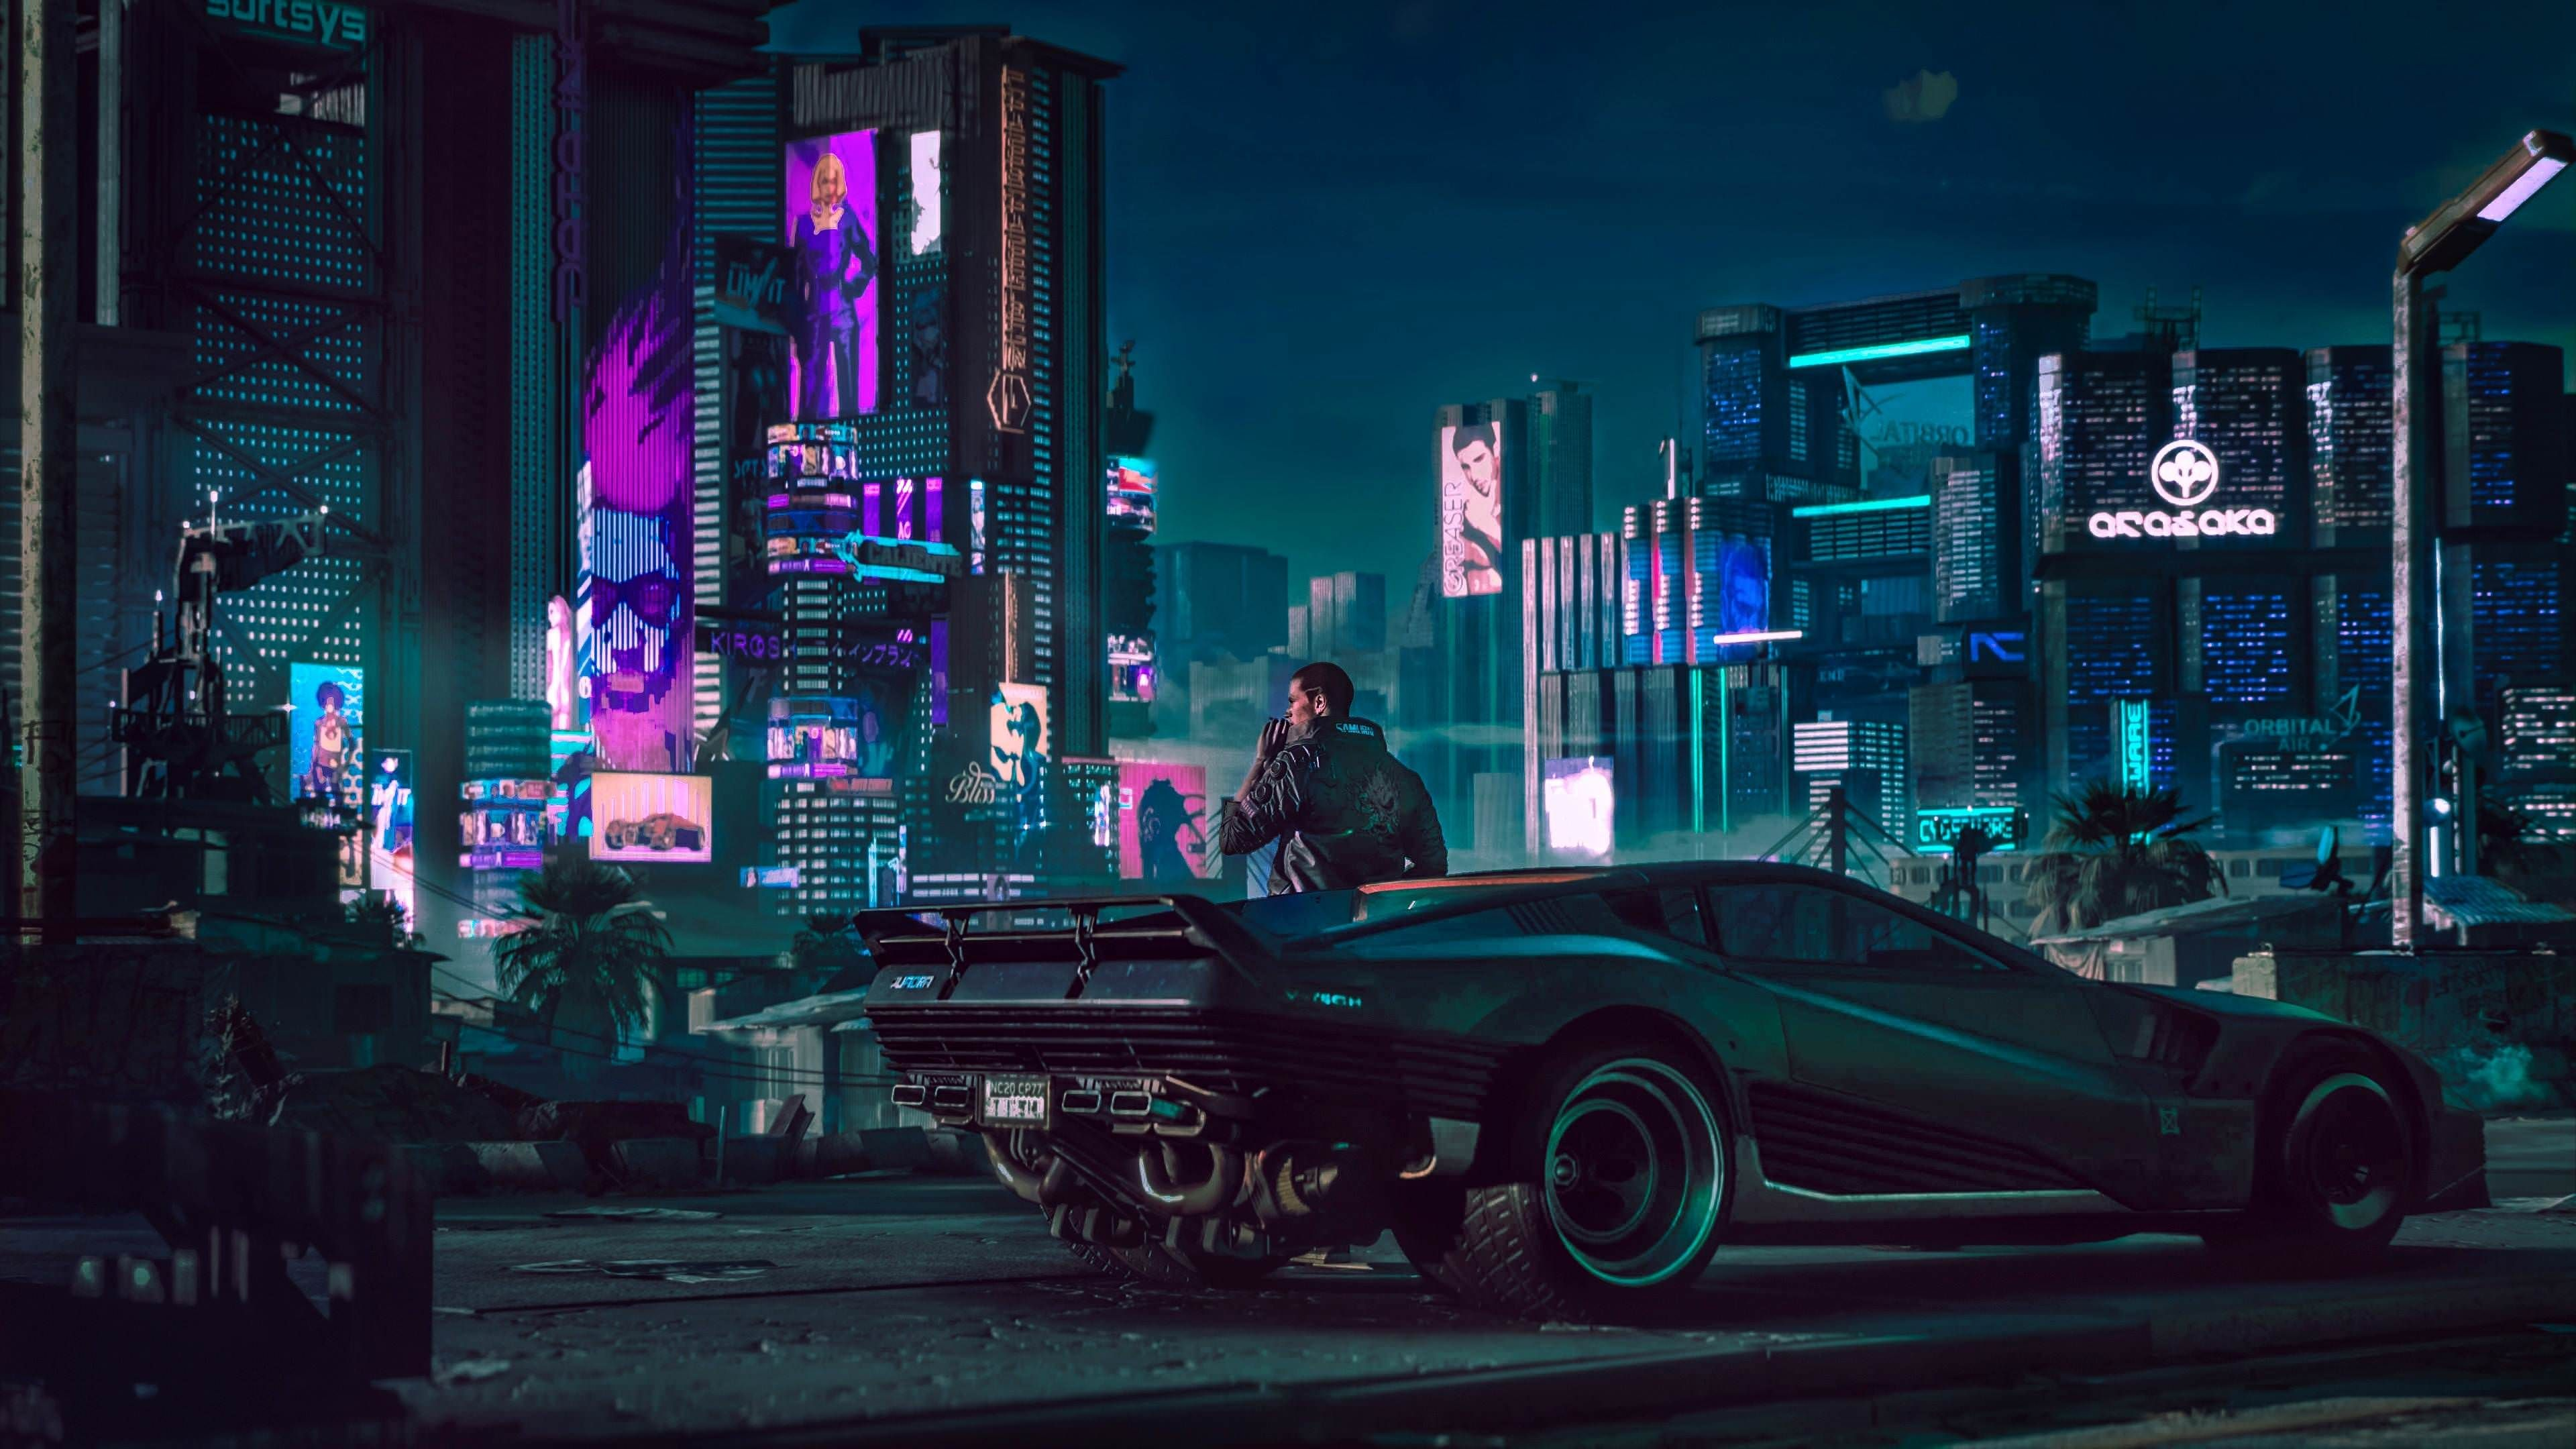 2018 Cyberpunk 2077 4k Https Www Pxwall Com 2018 Cyberpunk 2077 4k Futuristic City Cyberpunk 2077 Cyberpunk 2077 Trailer